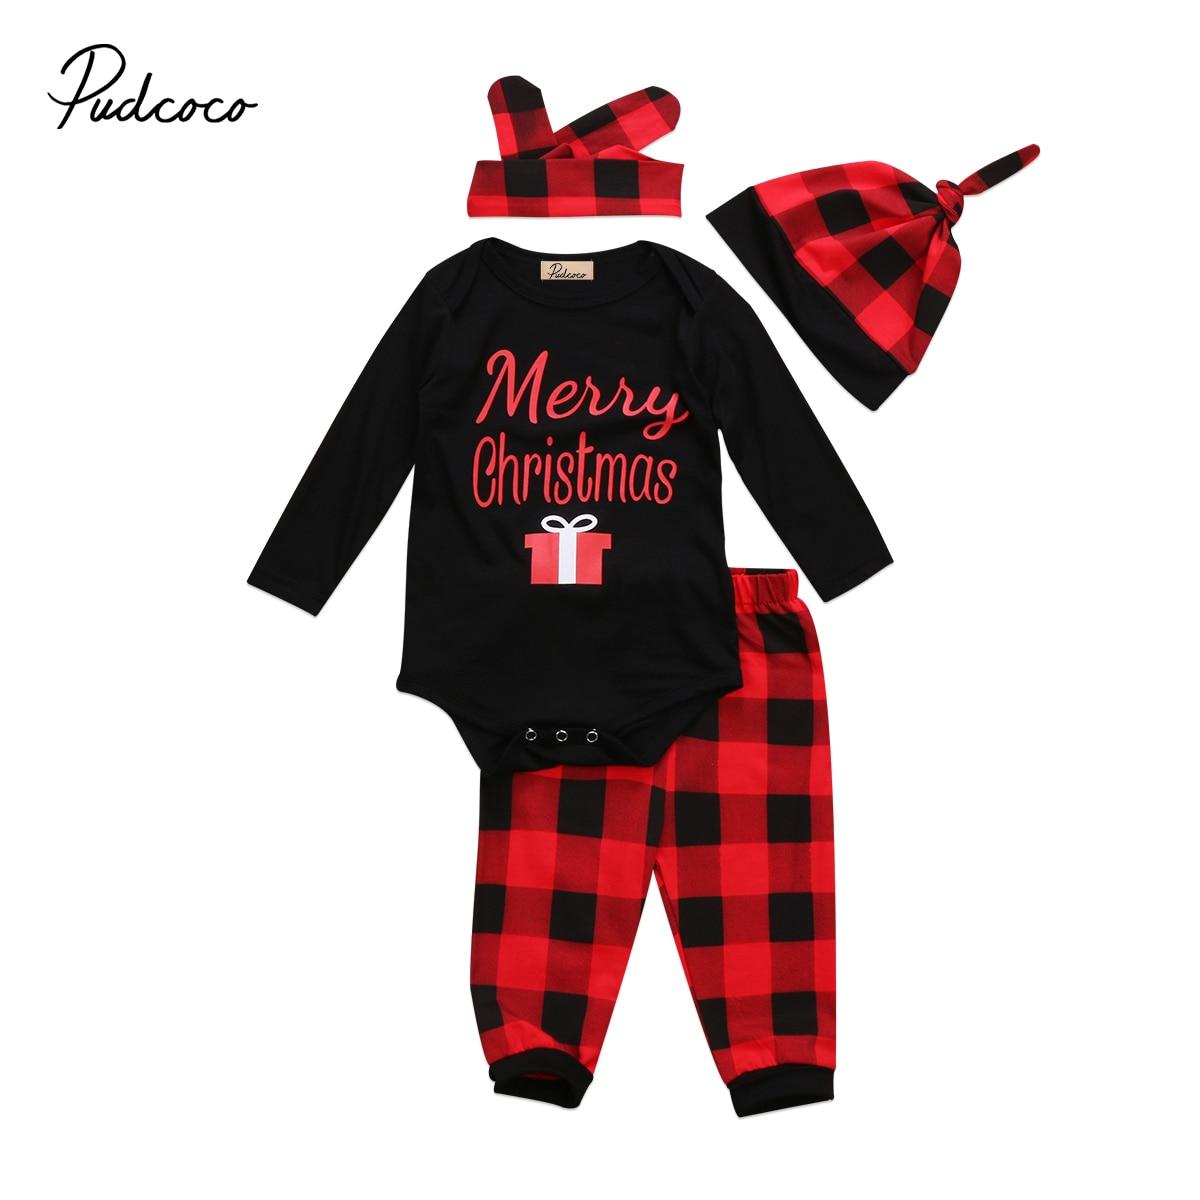 2017 Natal Pakaian Bayi Newborn Perempuan Rompers Lengan Baju Panjang Celana Kotak Merah Hitam Headband Topi 4 Pcs Katun Di Set